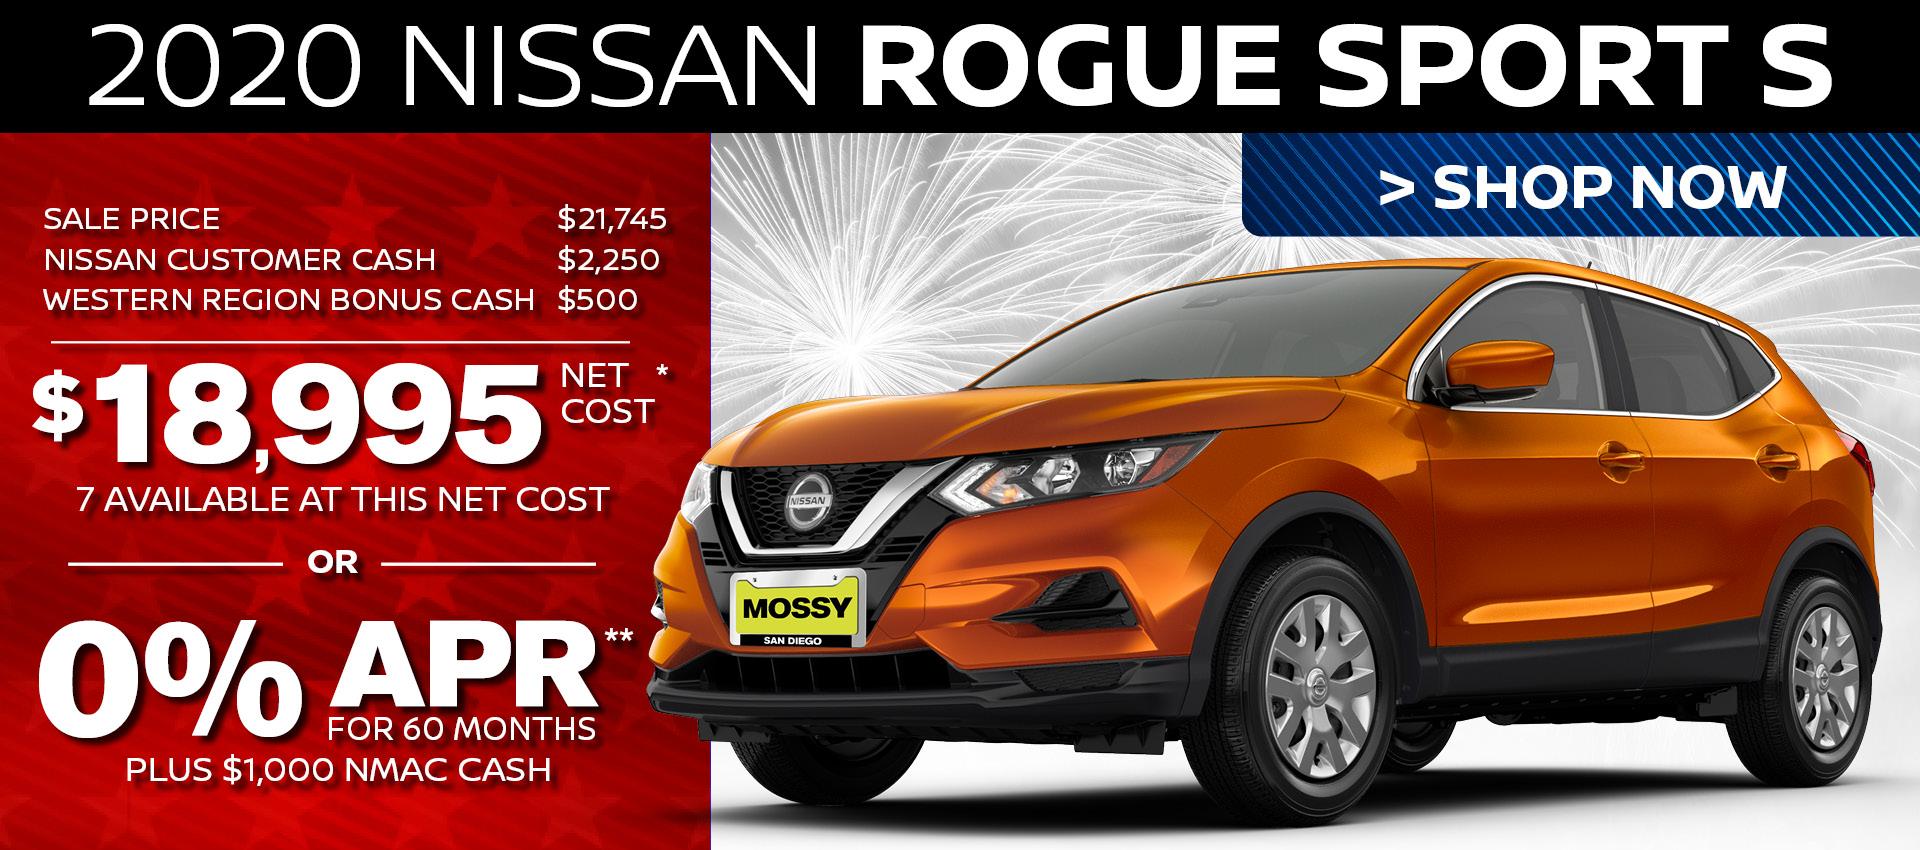 Mossy Nissan - Rogue Sport HP